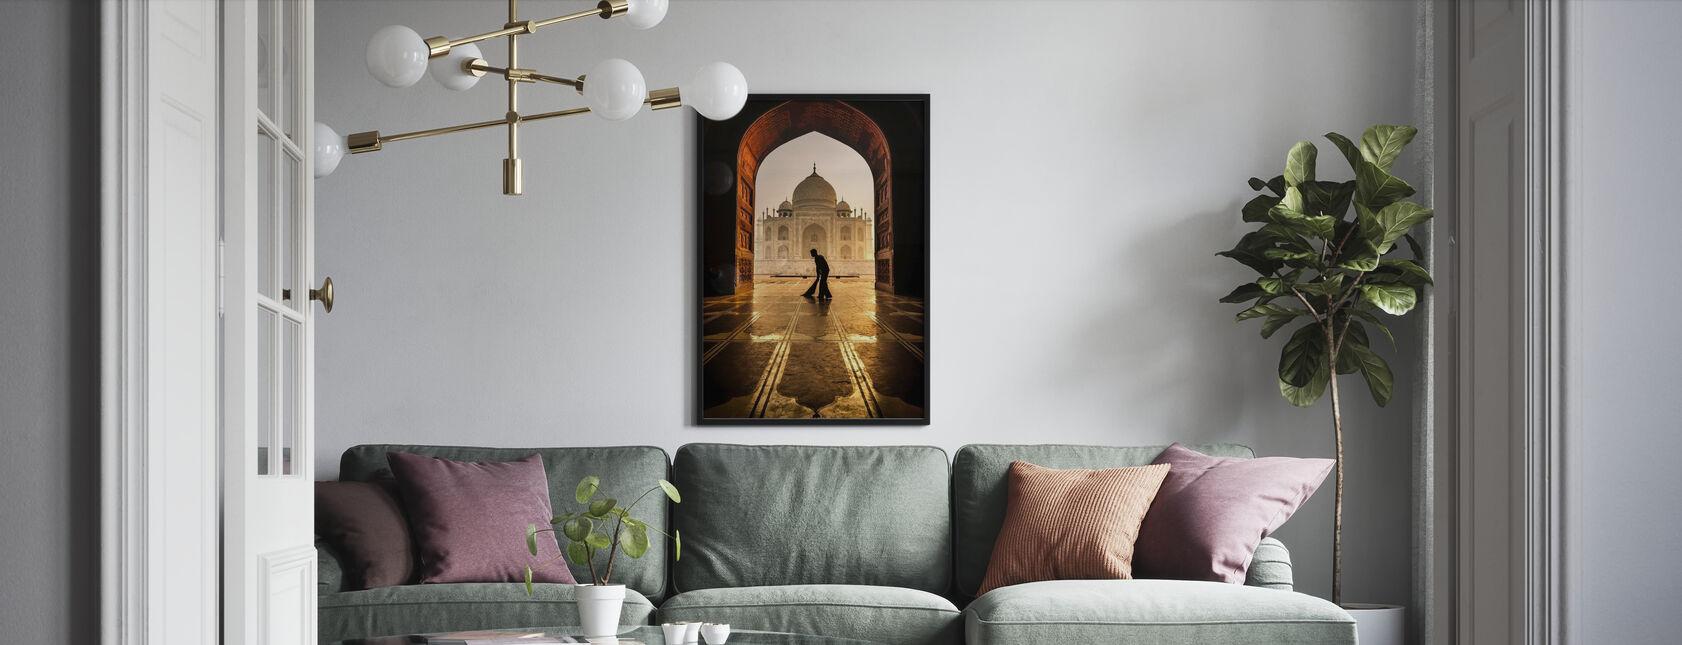 Taj Mahal Reiniger - Poster - Wohnzimmer